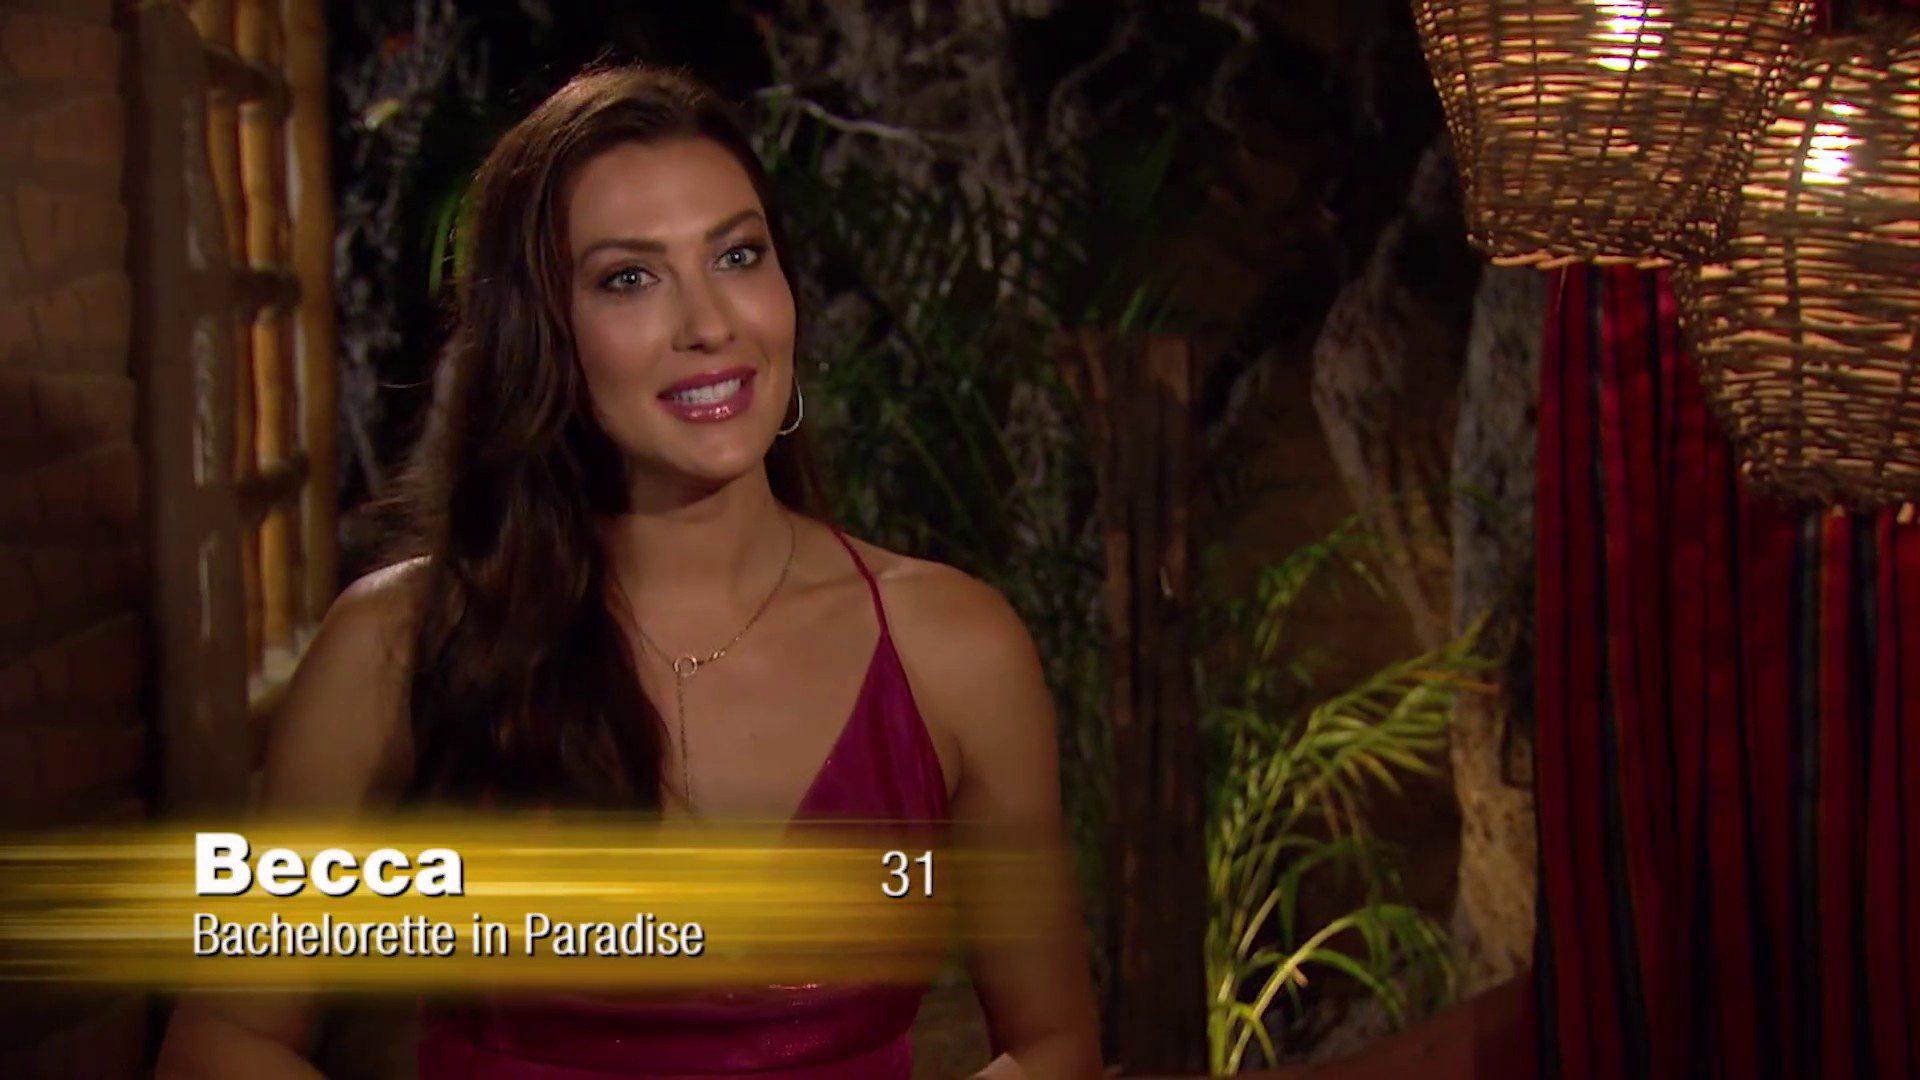 The Ending For Bachelor In Paradise Season 7 Episode 5